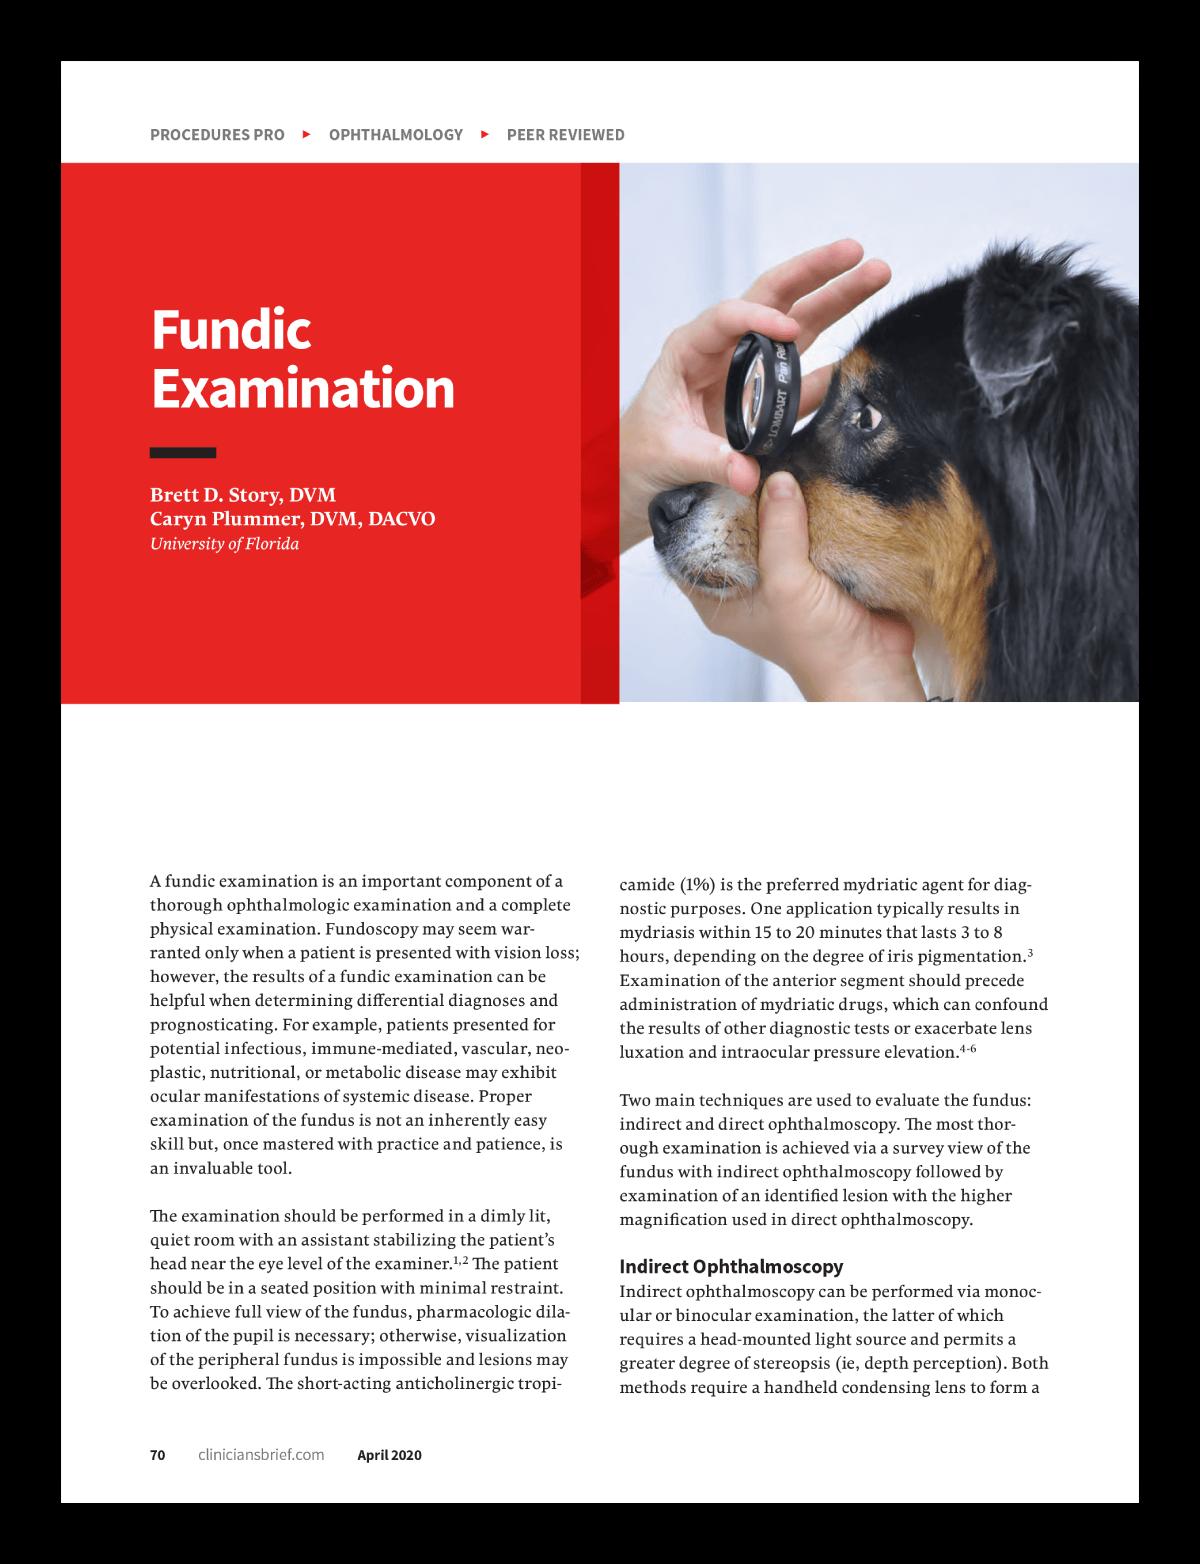 Procedures Pro: Fundic Examination